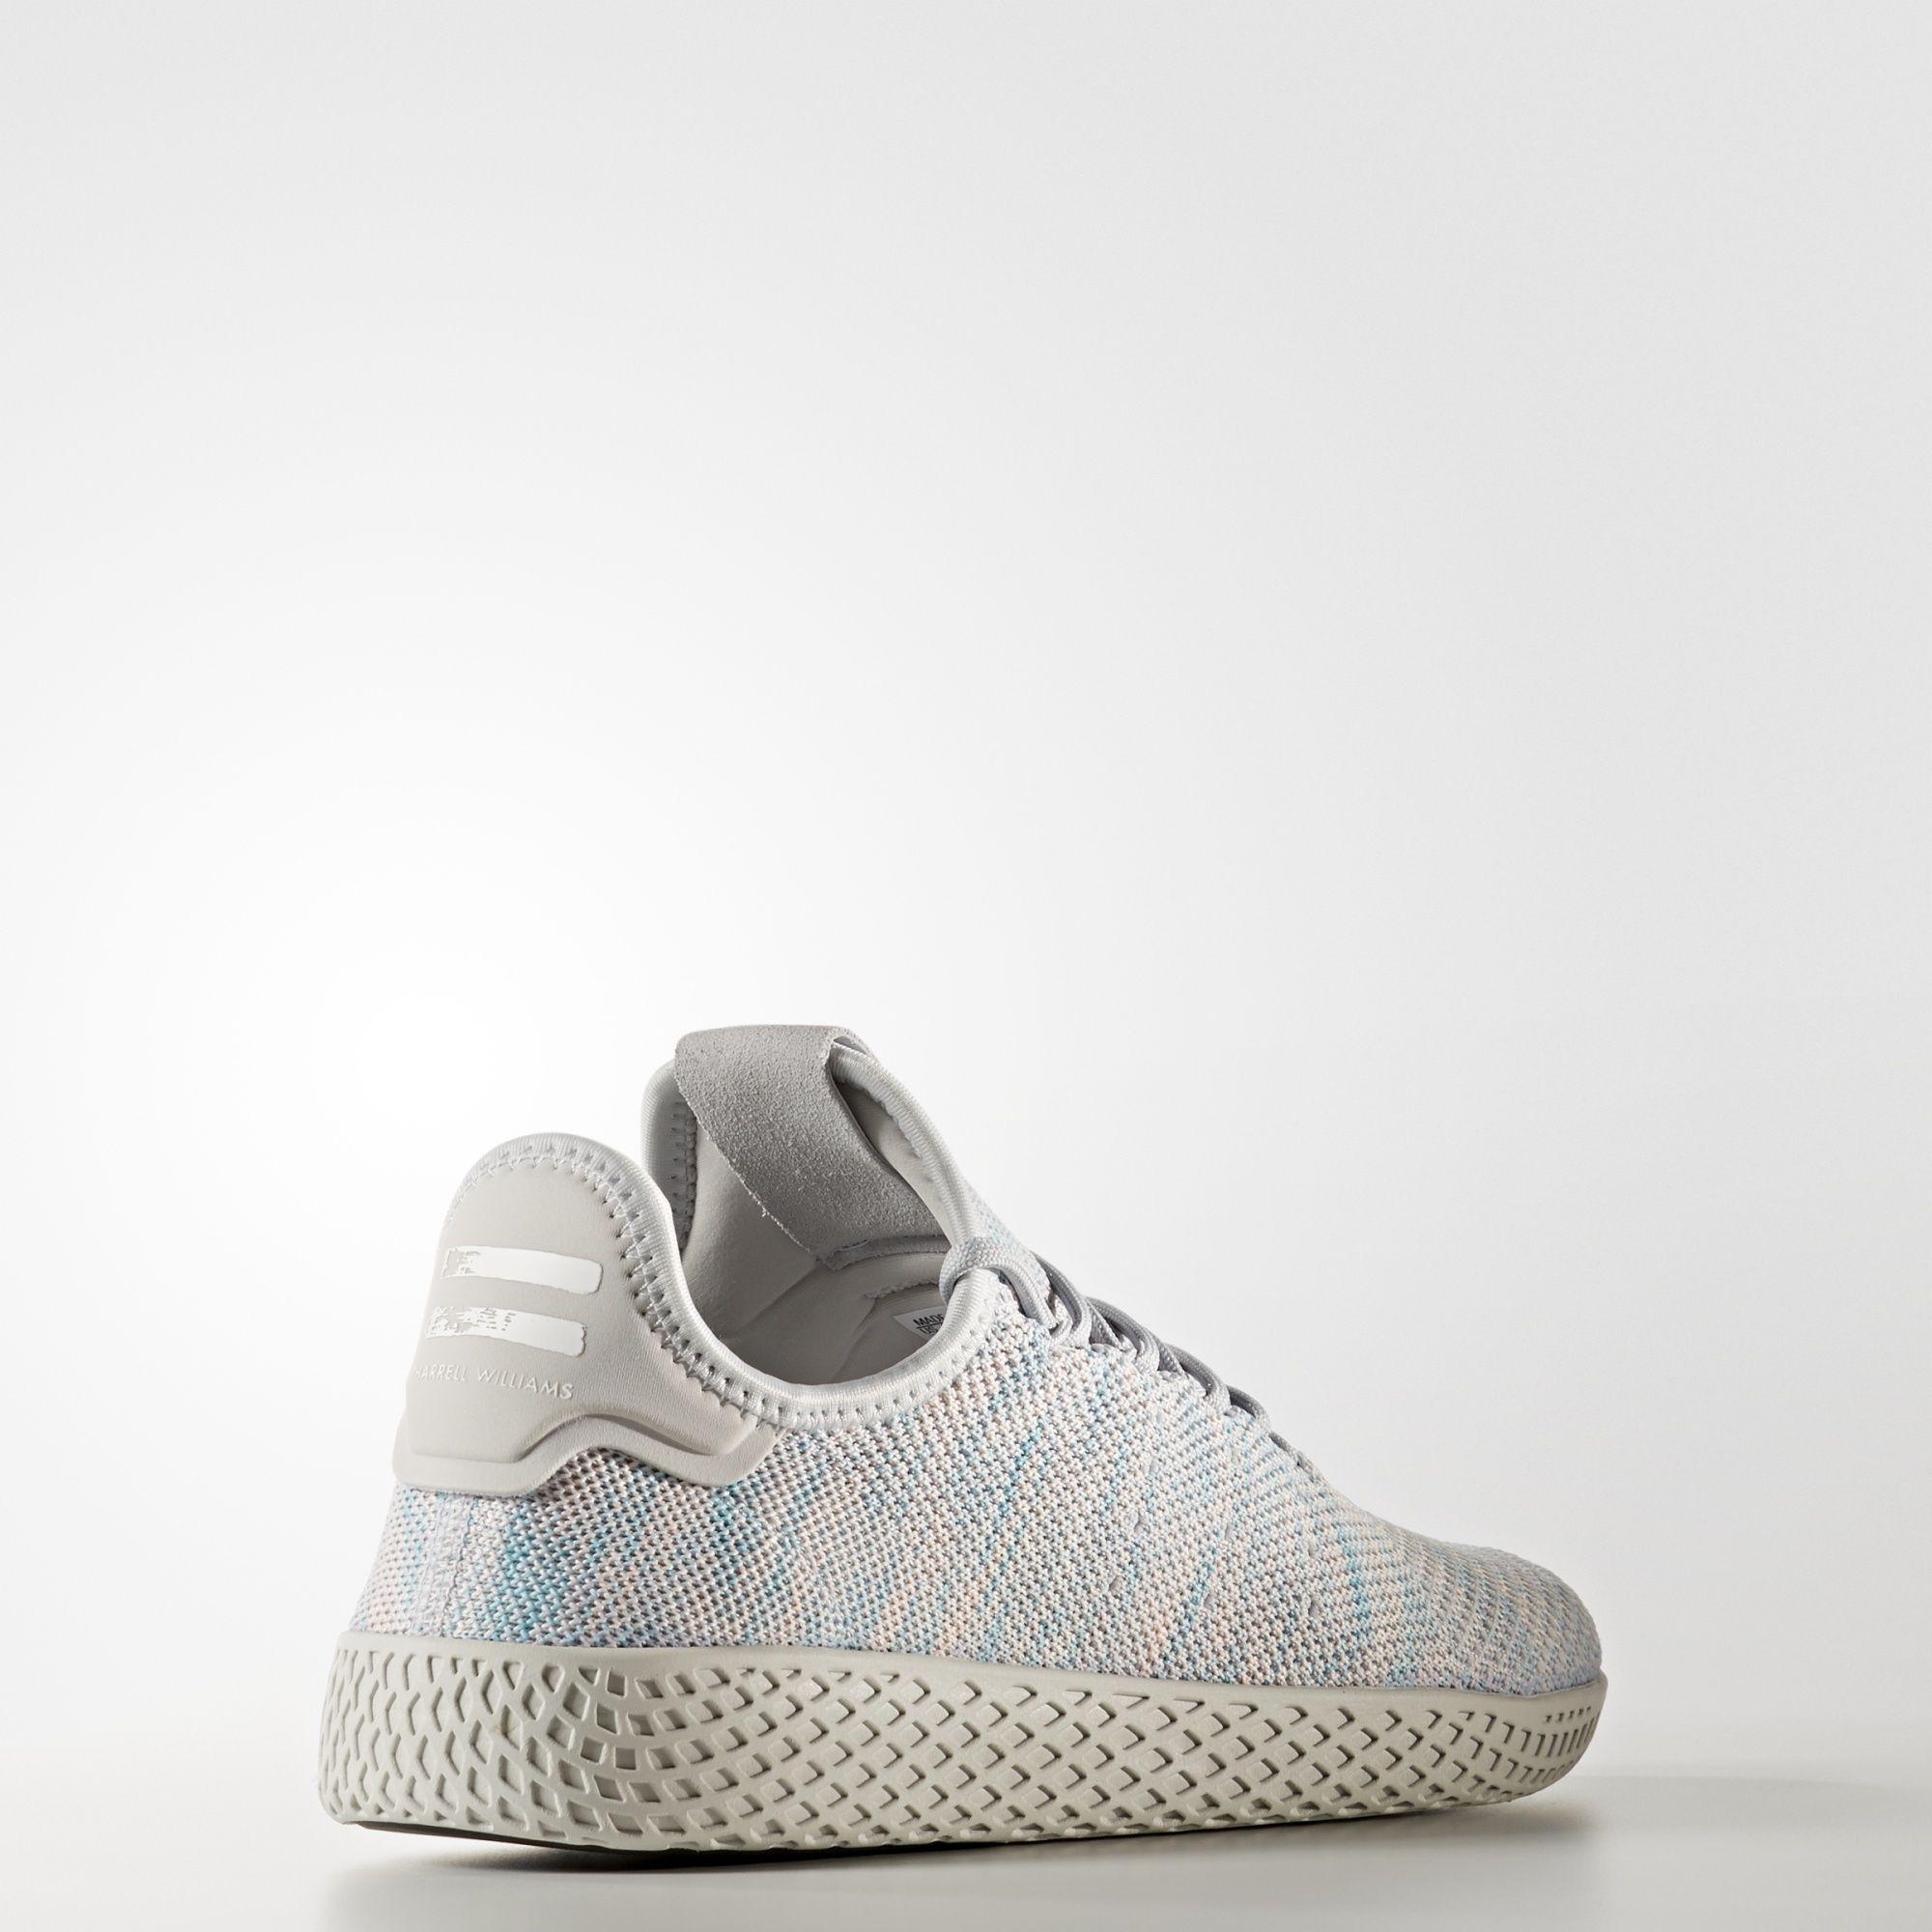 BY2671 Pharrell Williams x adidas Tennis HU Semi Frozen Yellow 3